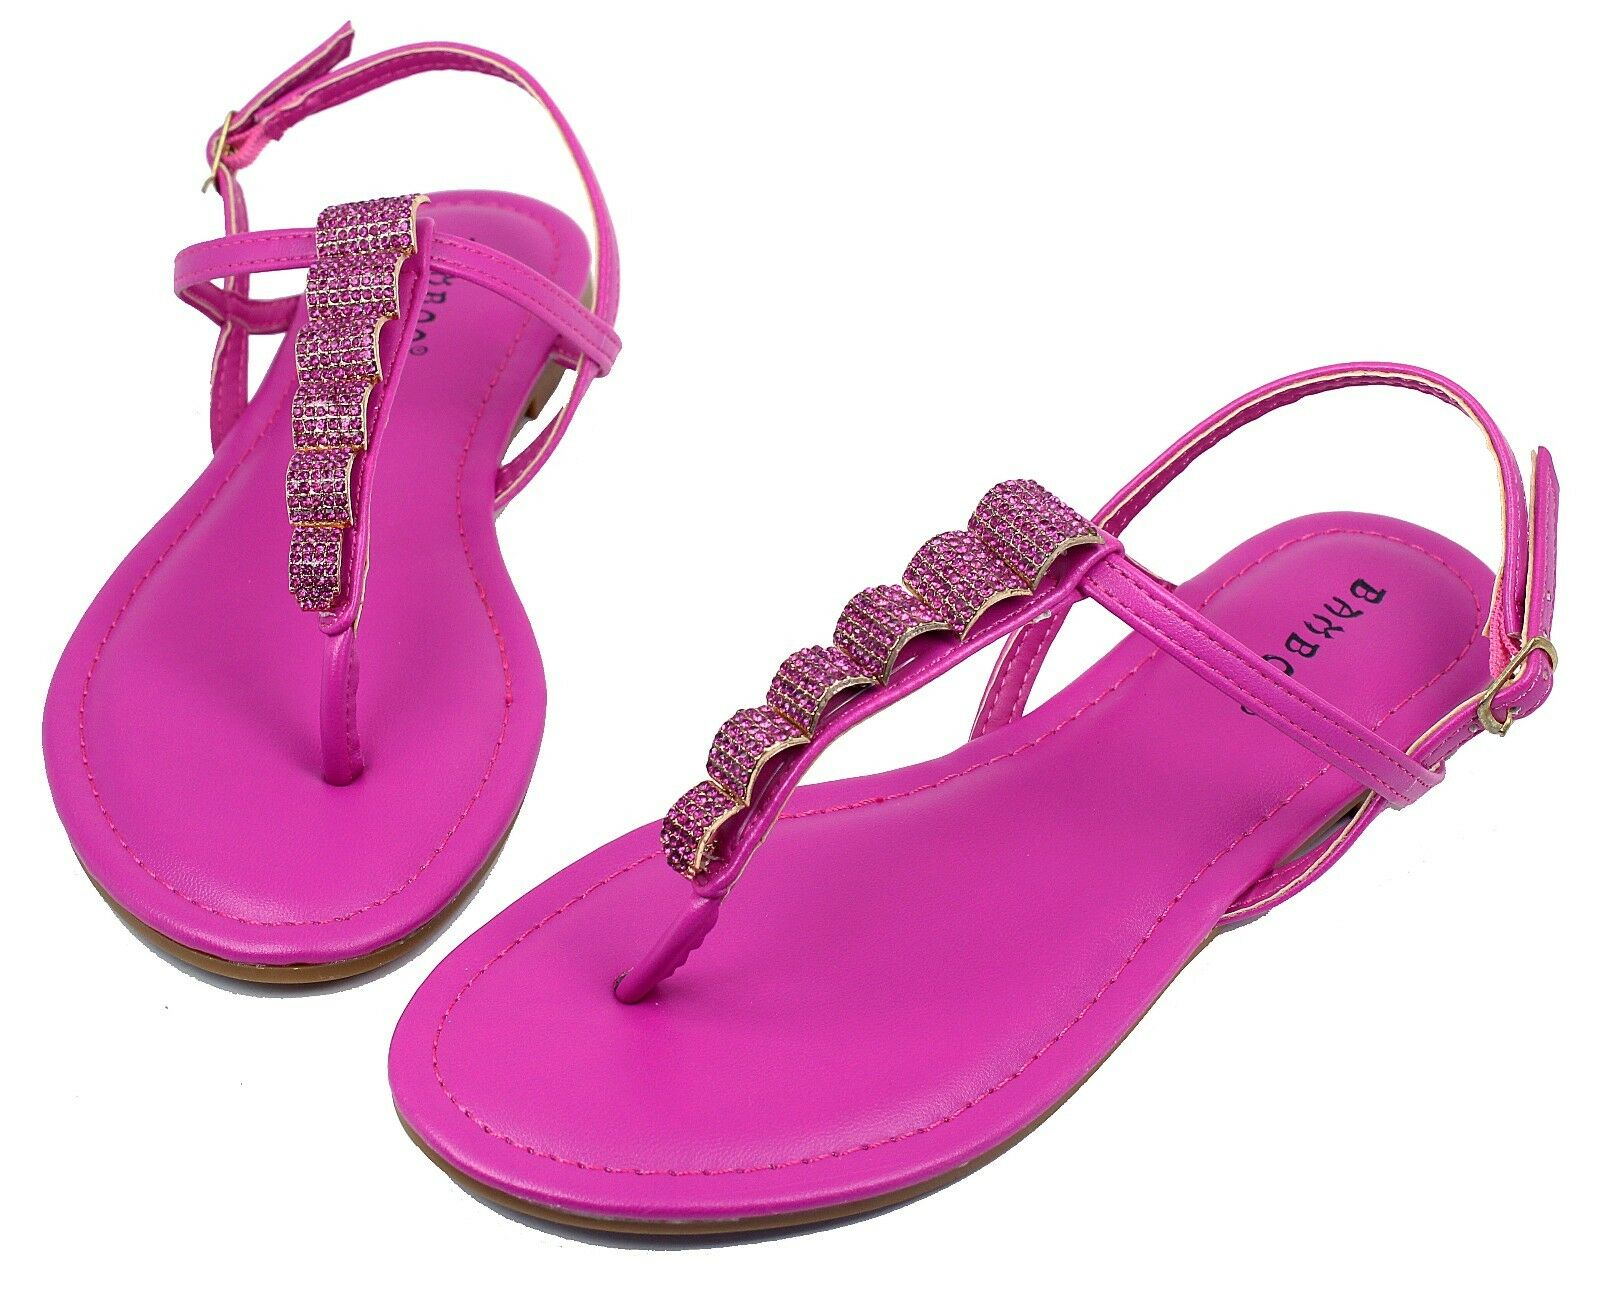 Josalyn-19 Precious Stone Flats Sandals Gladiator Party Women Shoes Shoes Women Fuchsia 8.5 4af447